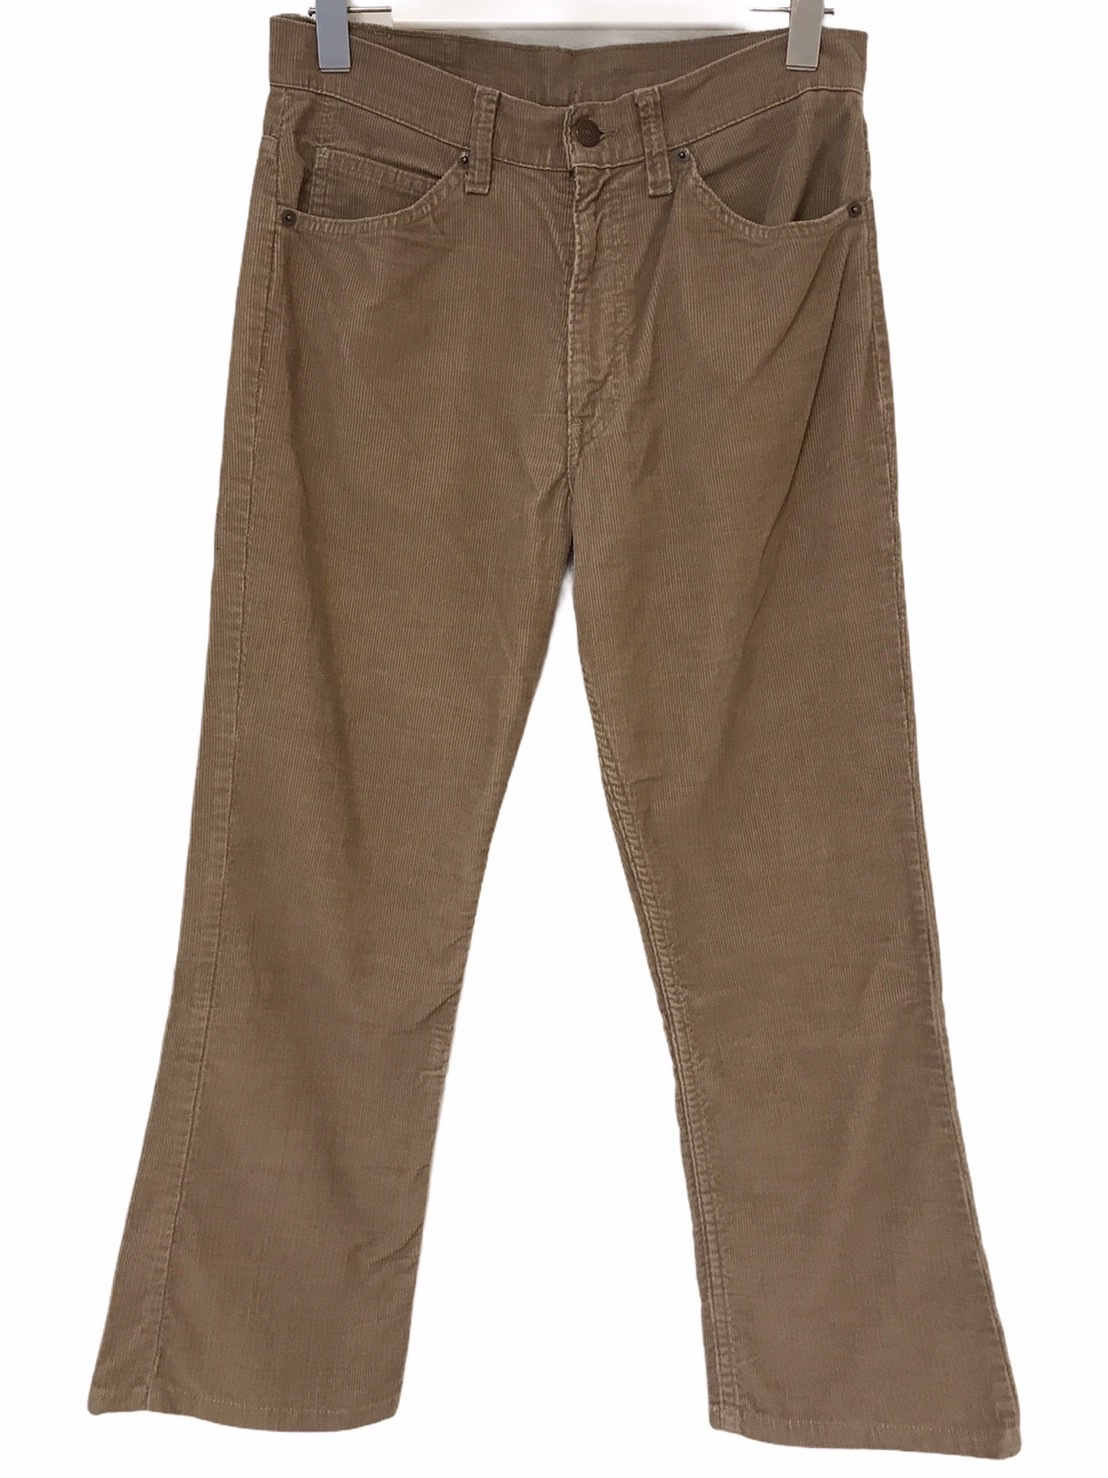 80's Levis 517 Corduroy pants Beige 42talon made in USA W30